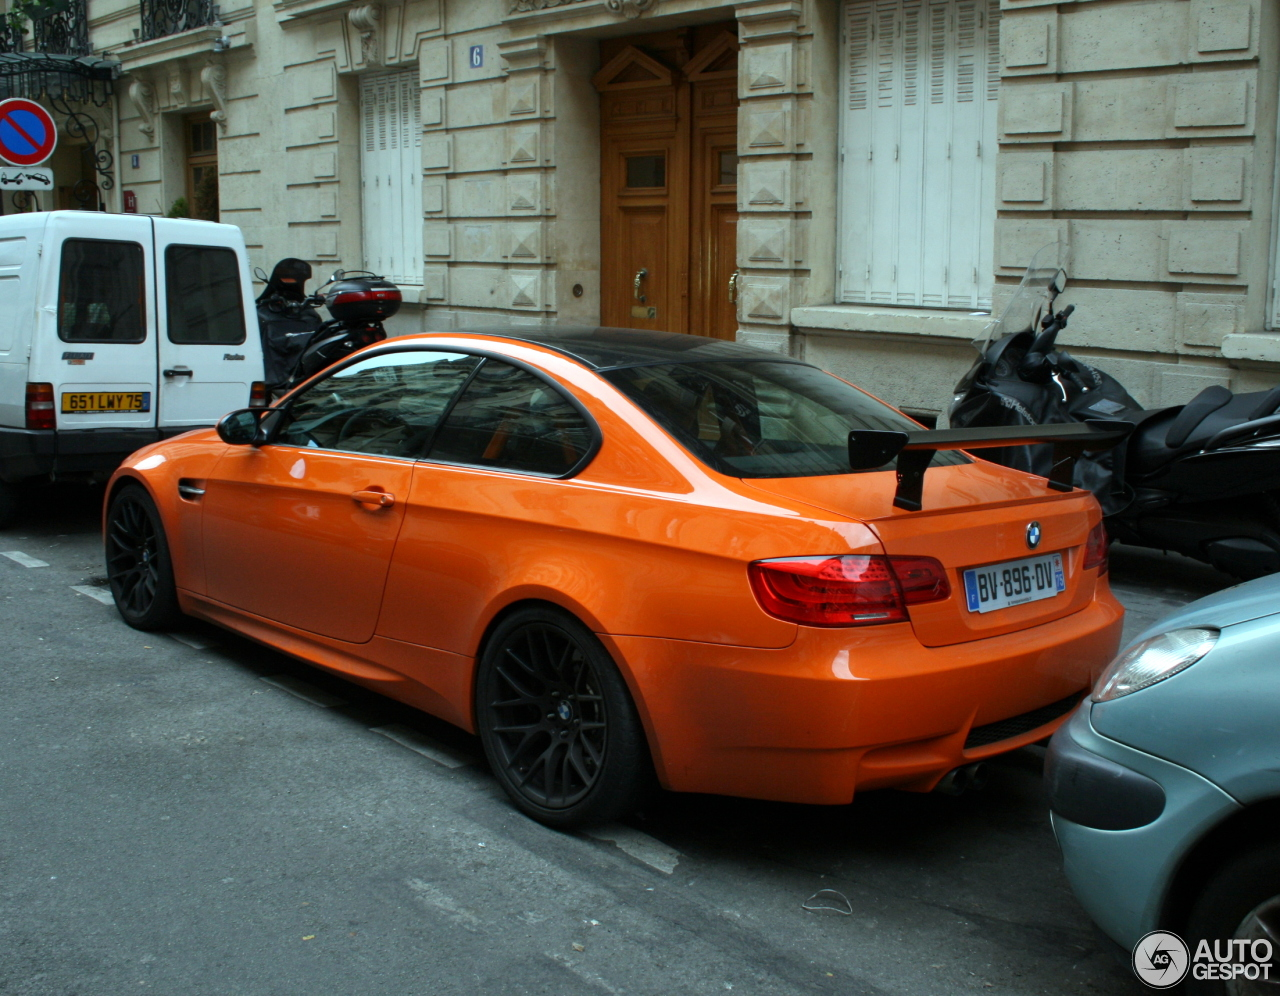 BMW M3 GTS - 12 January 2014 - Autogespot